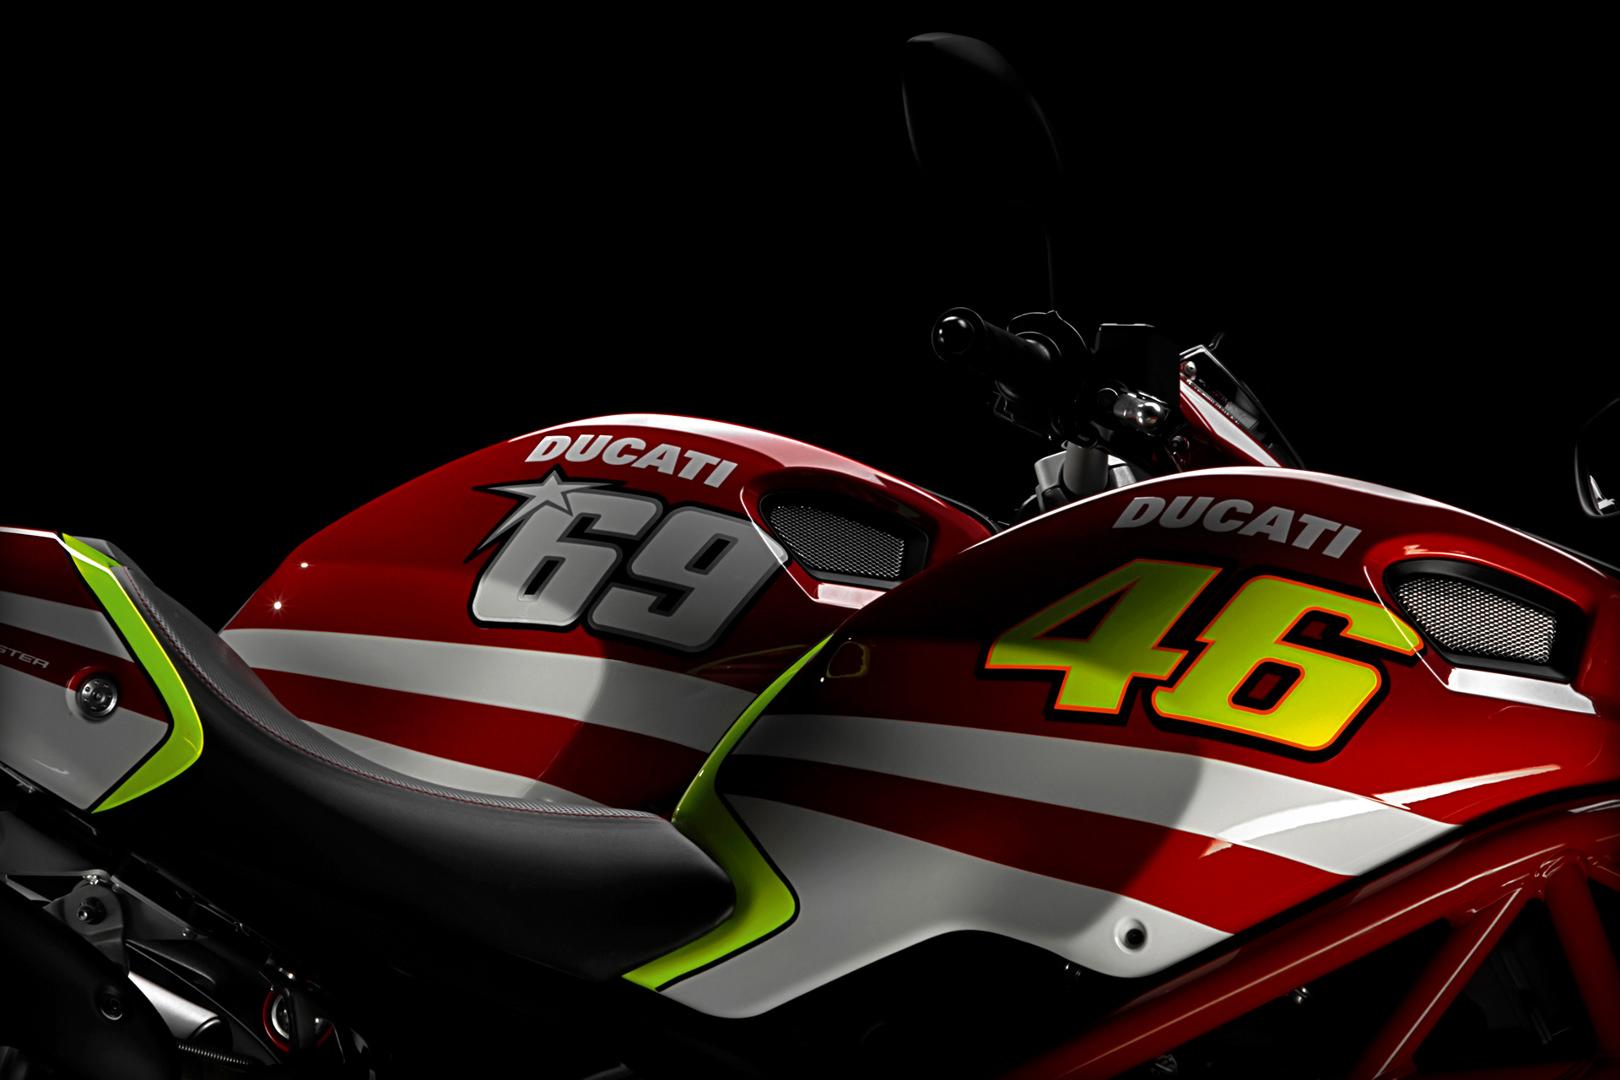 Monster ART MotoGP - LOGOMANIA - Galeries photos - MOTOPLANETE